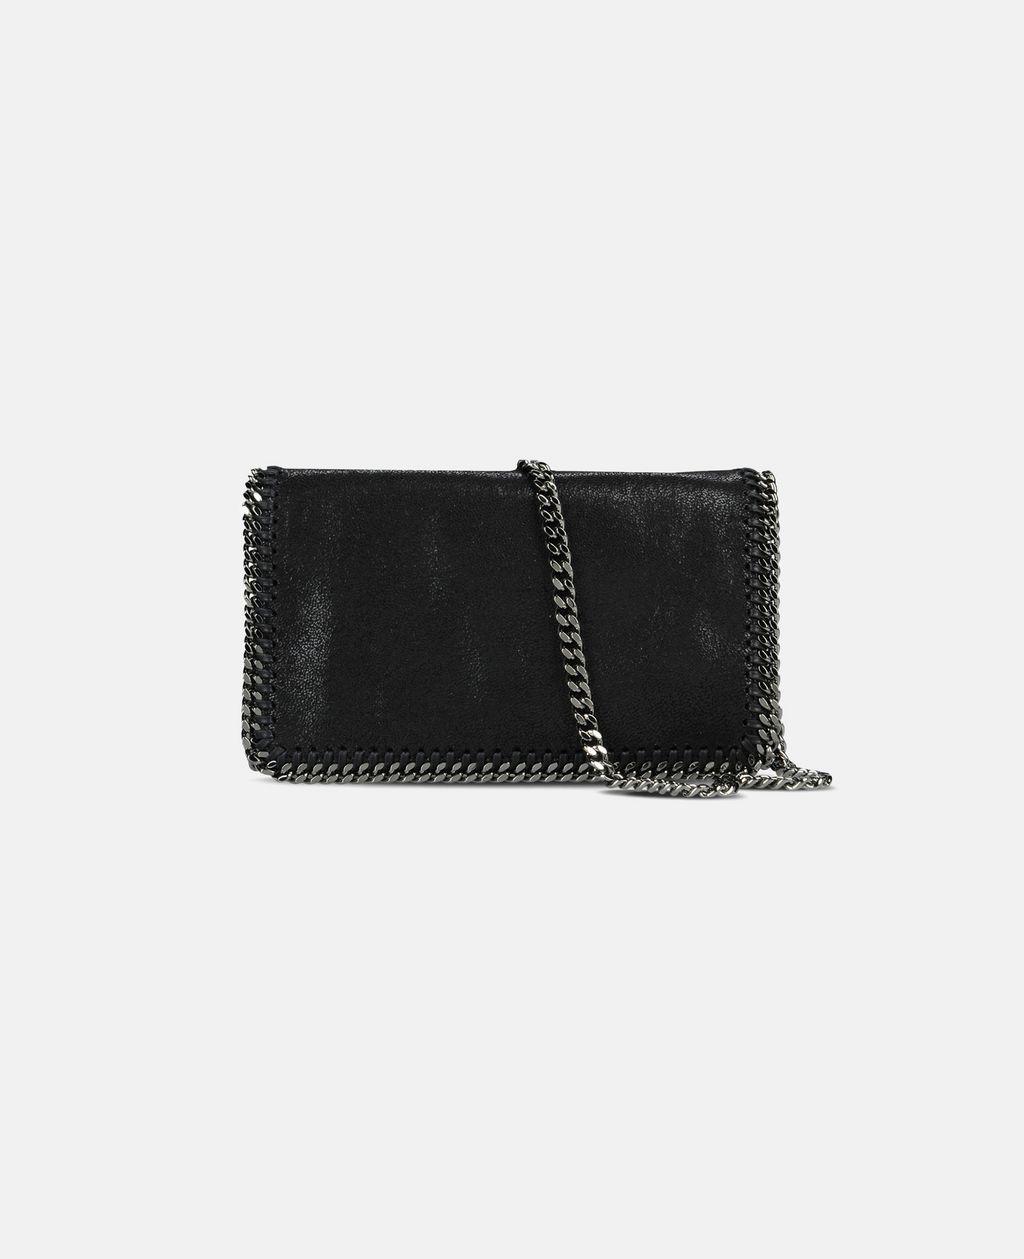 Black Falabella Cross Body Bag  - STELLA MCCARTNEY